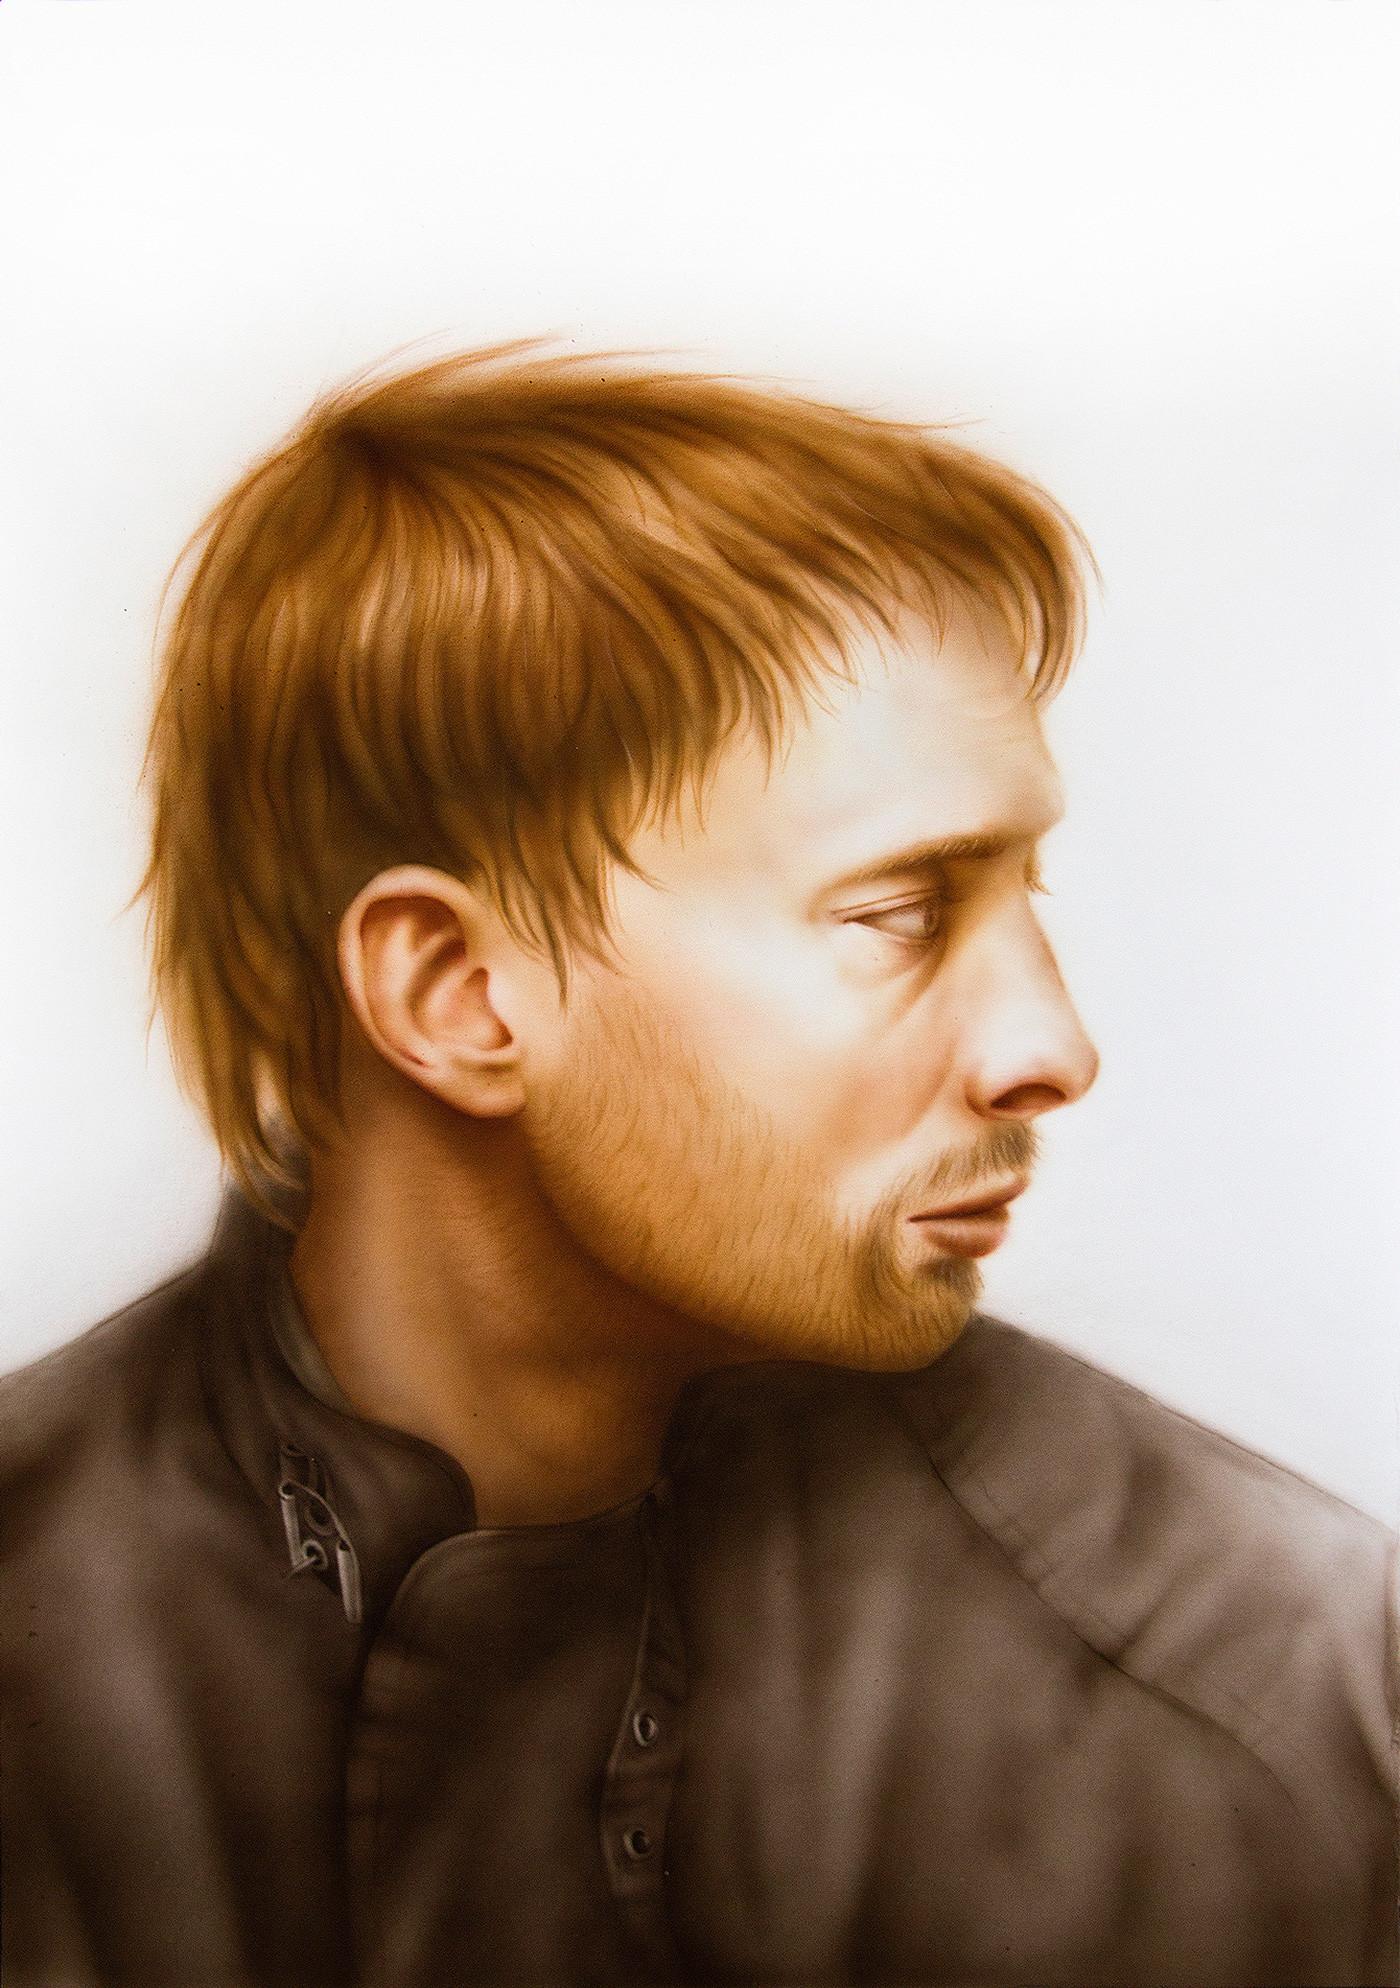 Max dmytriv